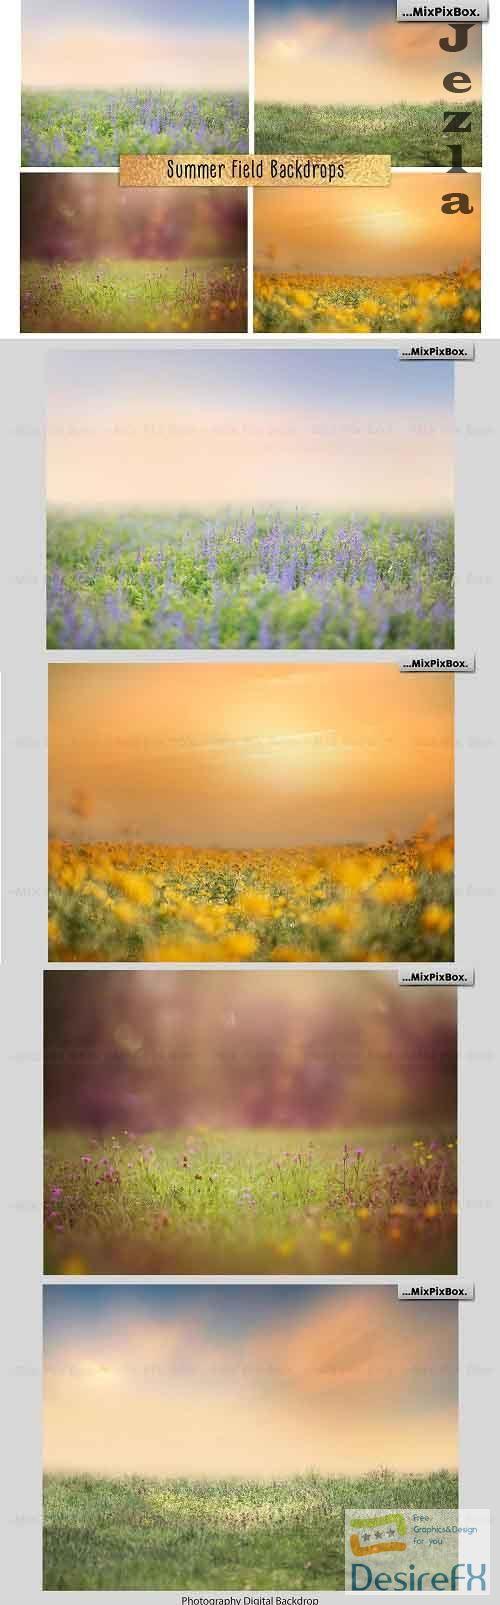 Summer Field Backdrops - 4970525